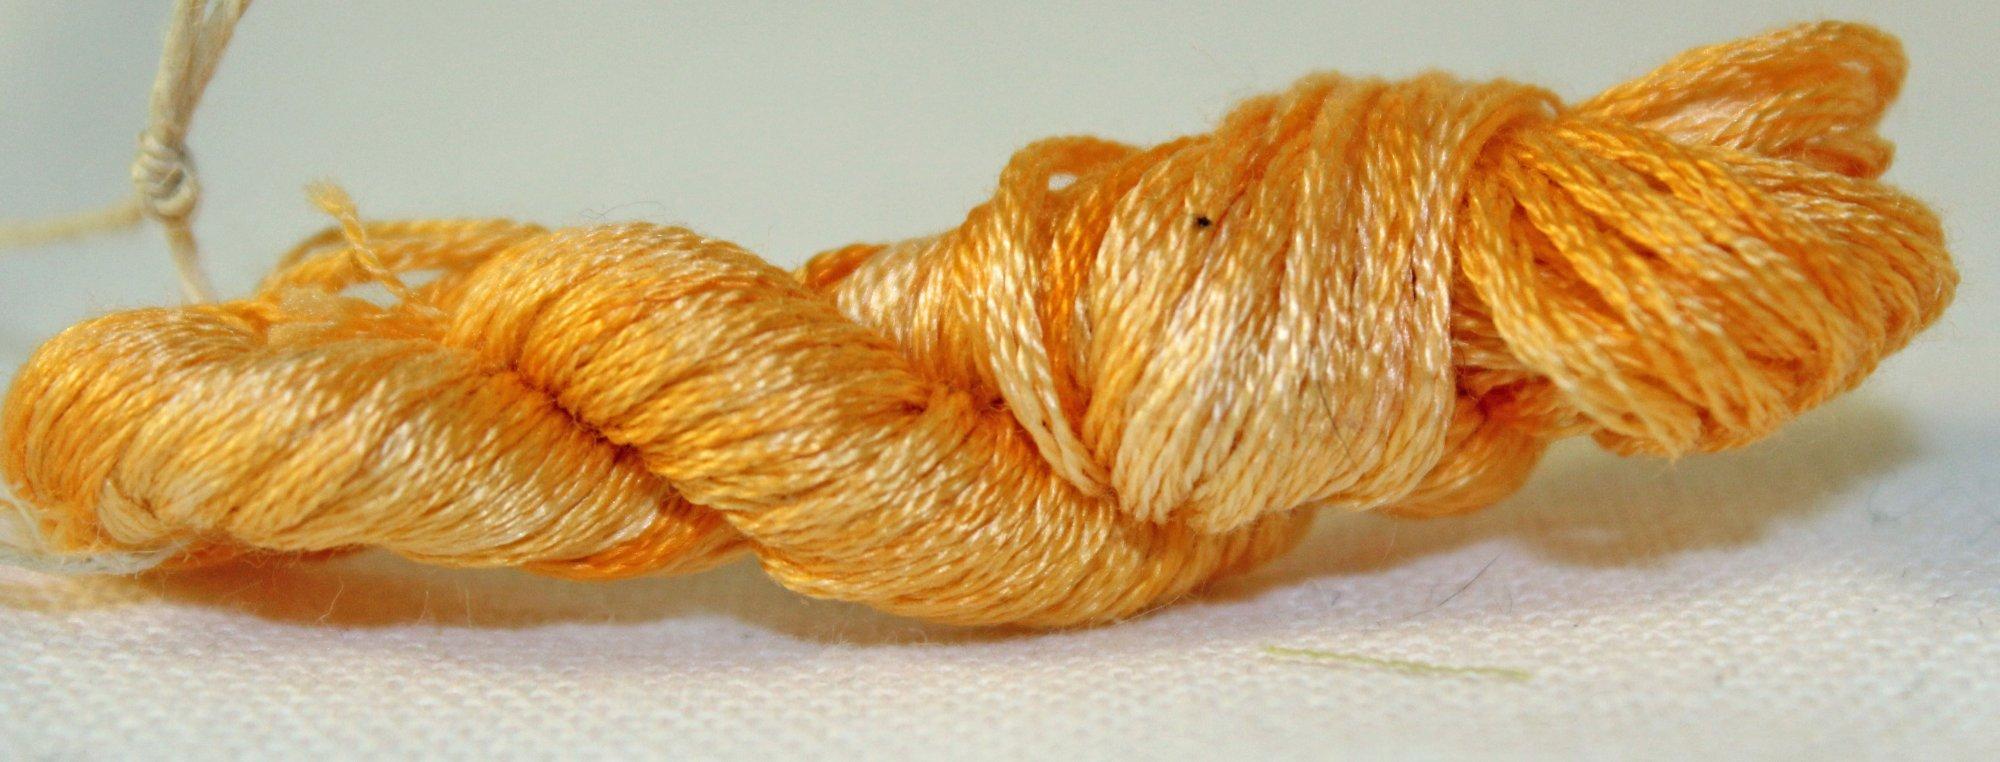 Pumpkin- Hand-dyed Embroidery Floss